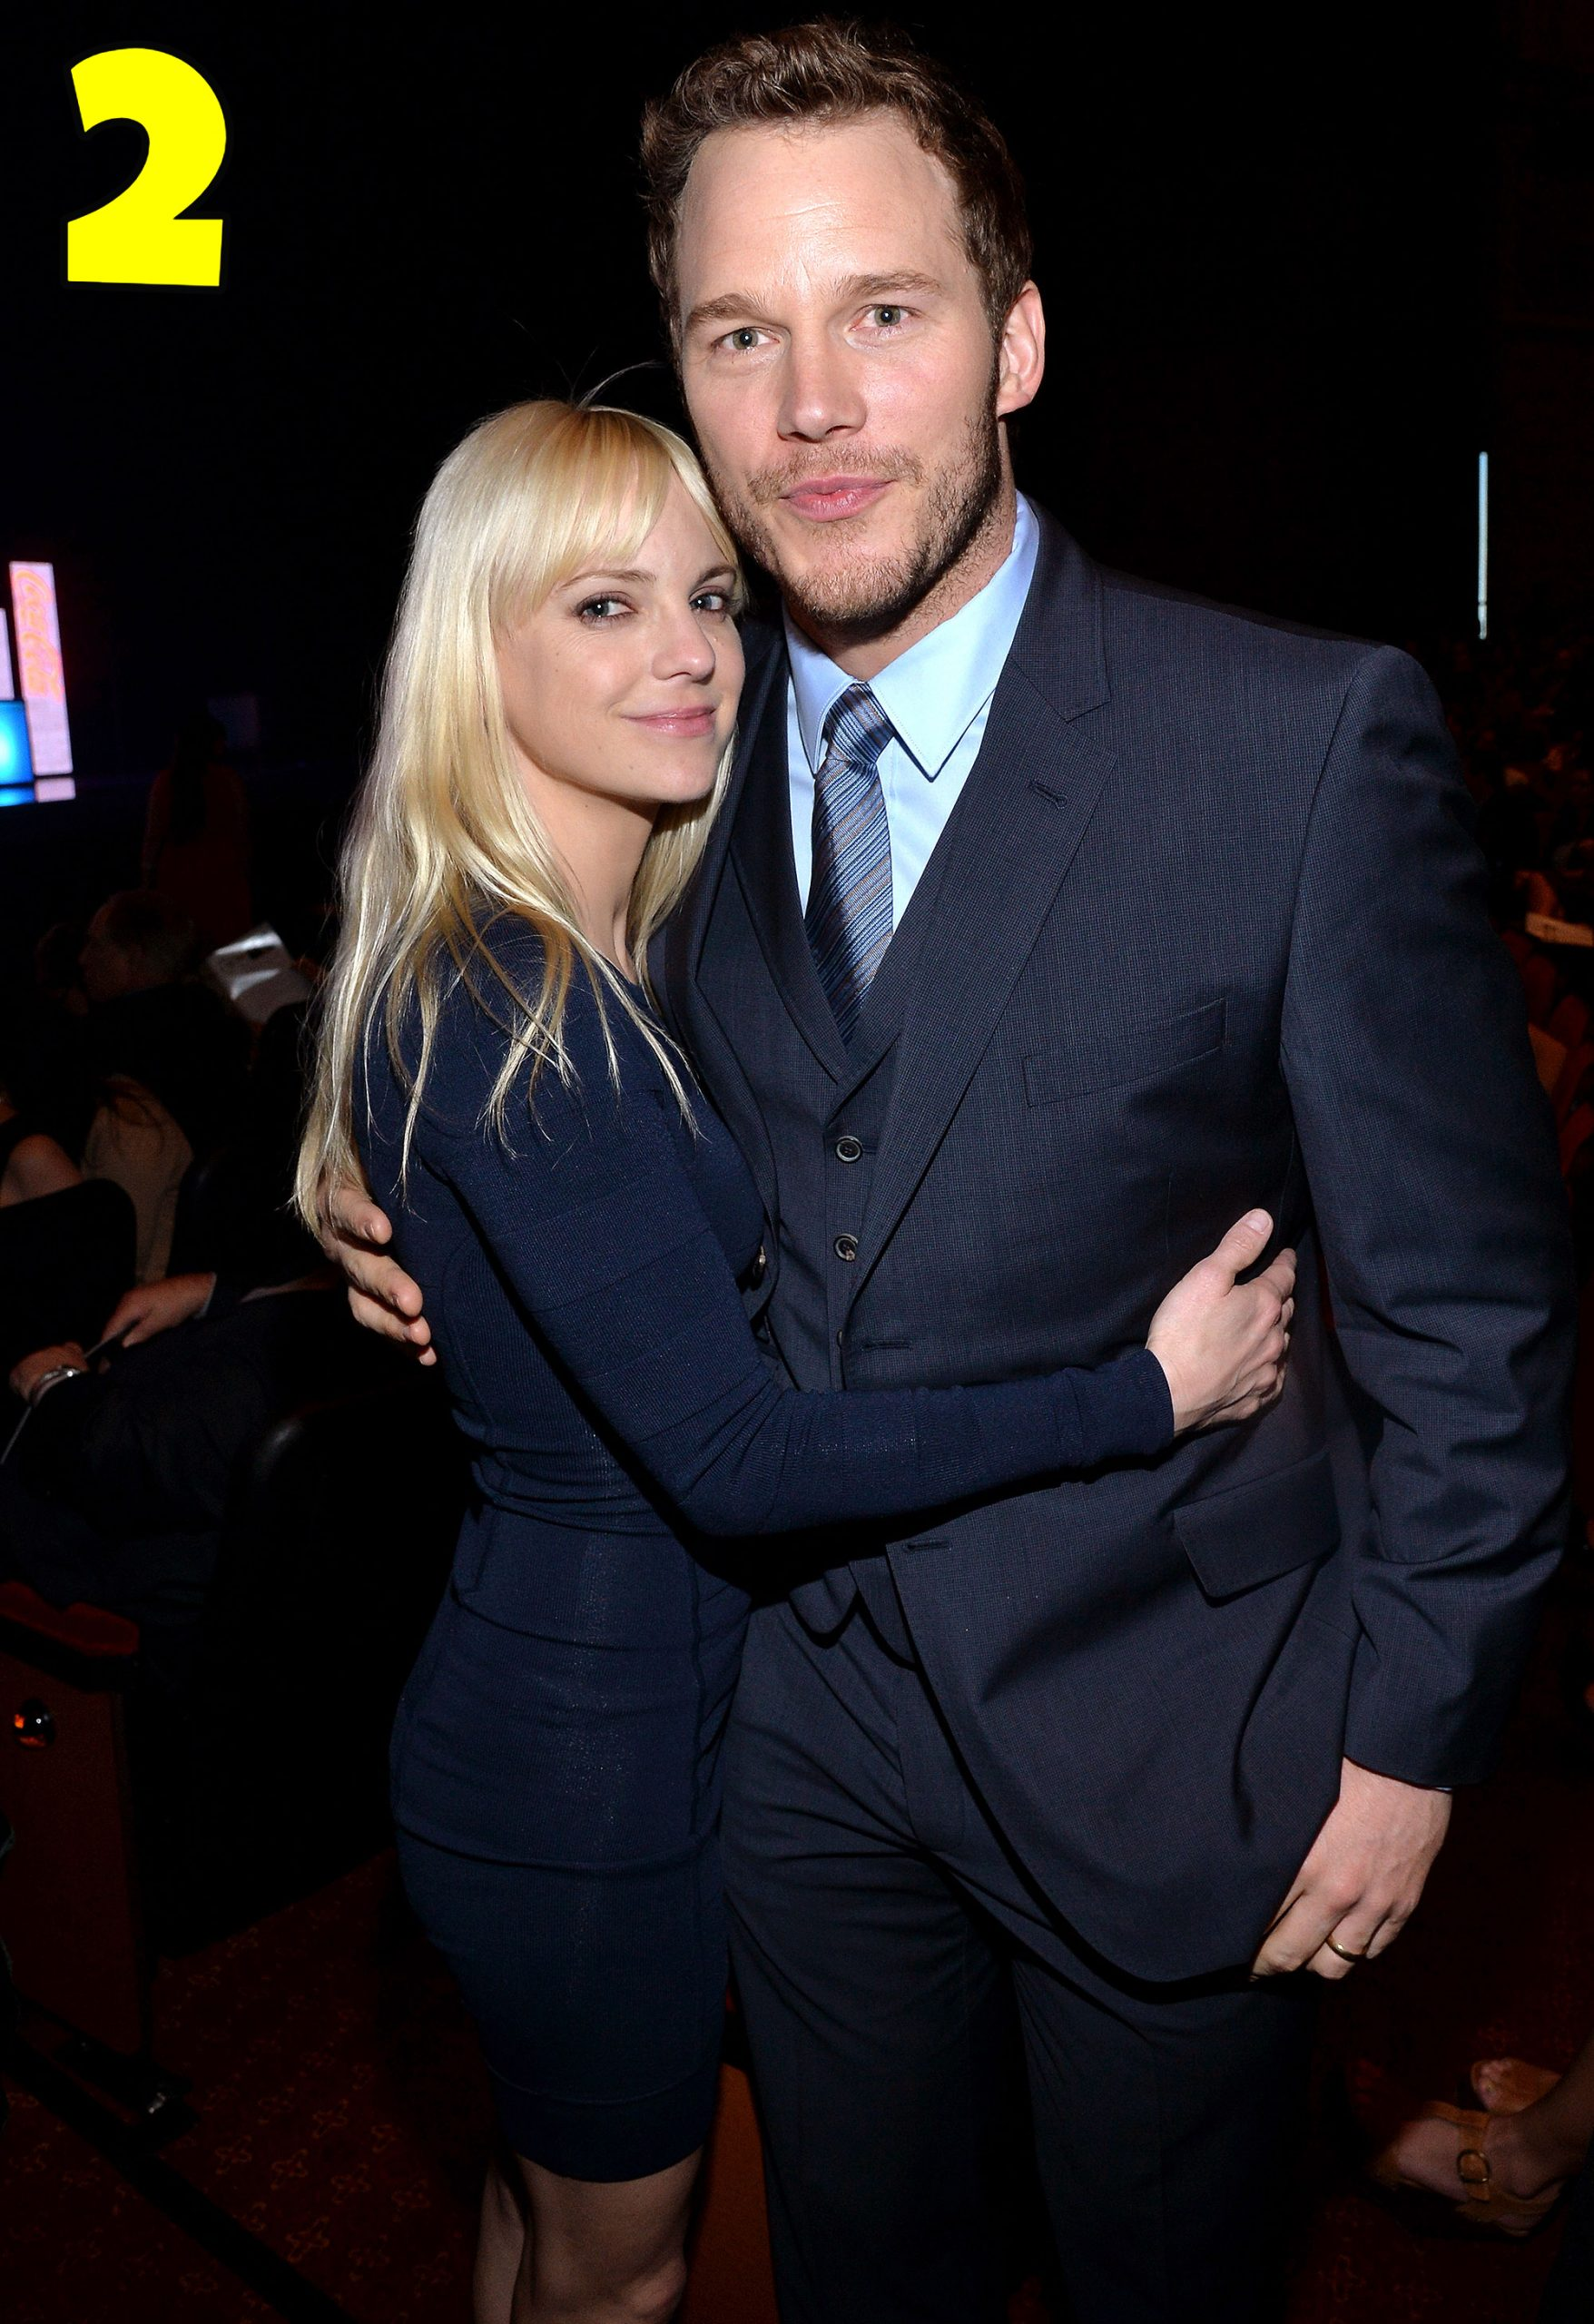 Chris Pratt and Anna Faris Dating